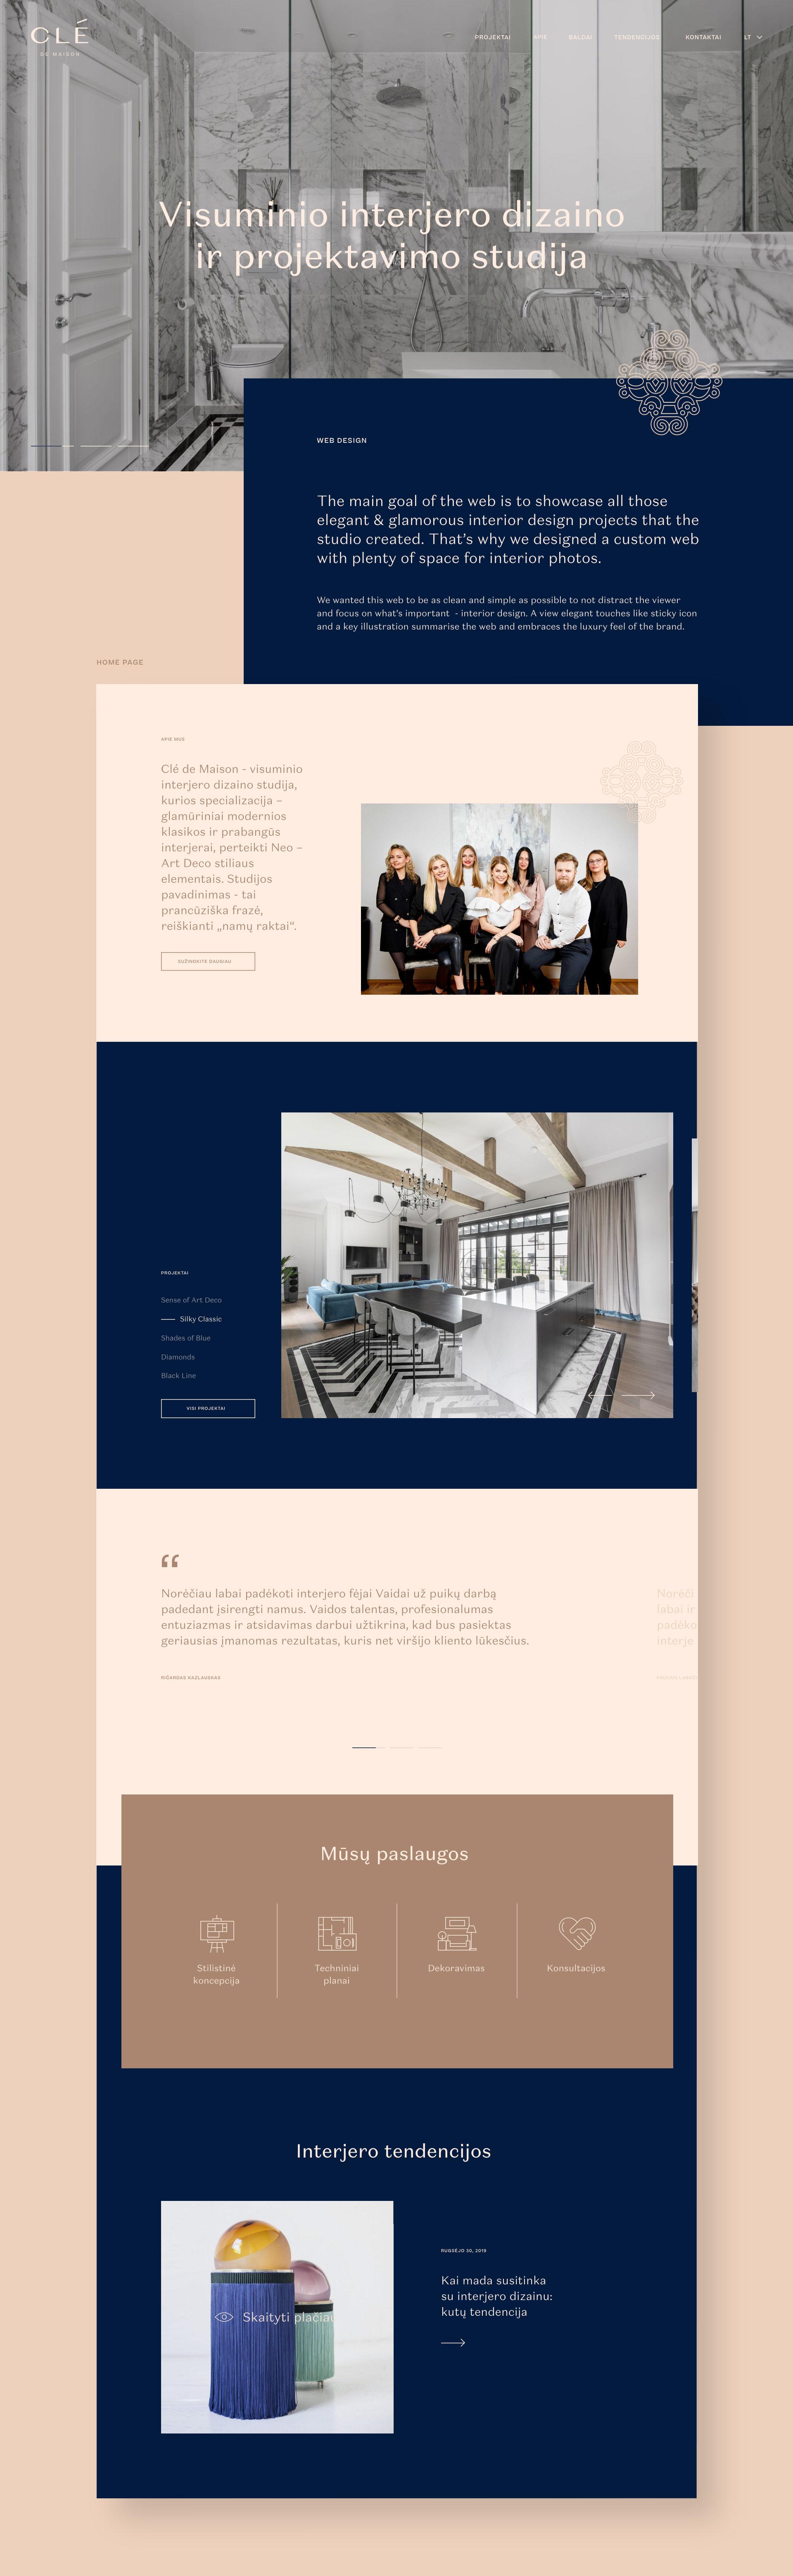 Clé de Maison - luxurious interior design studio branding ...